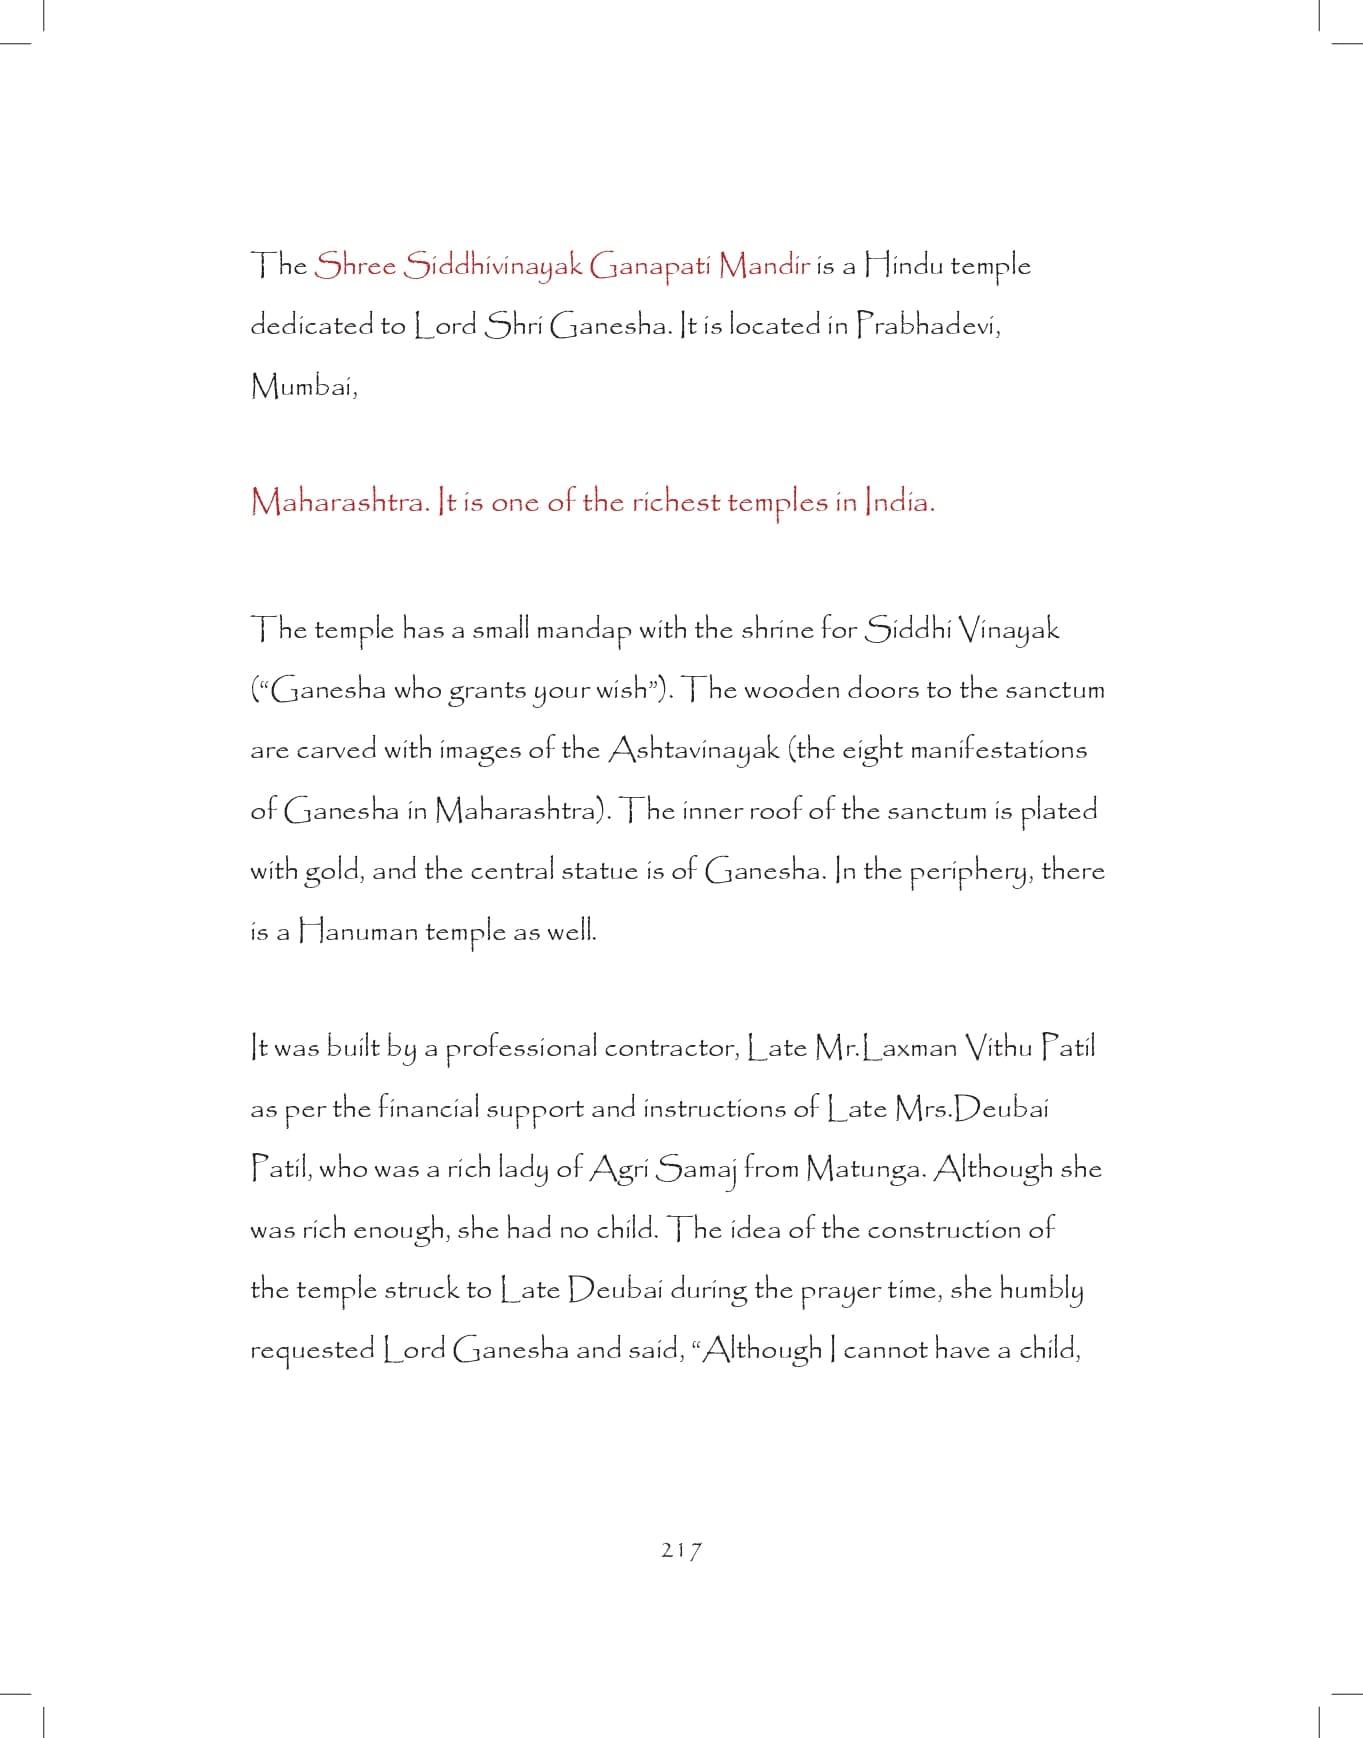 Ganesh-print_pages-to-jpg-0217.jpg